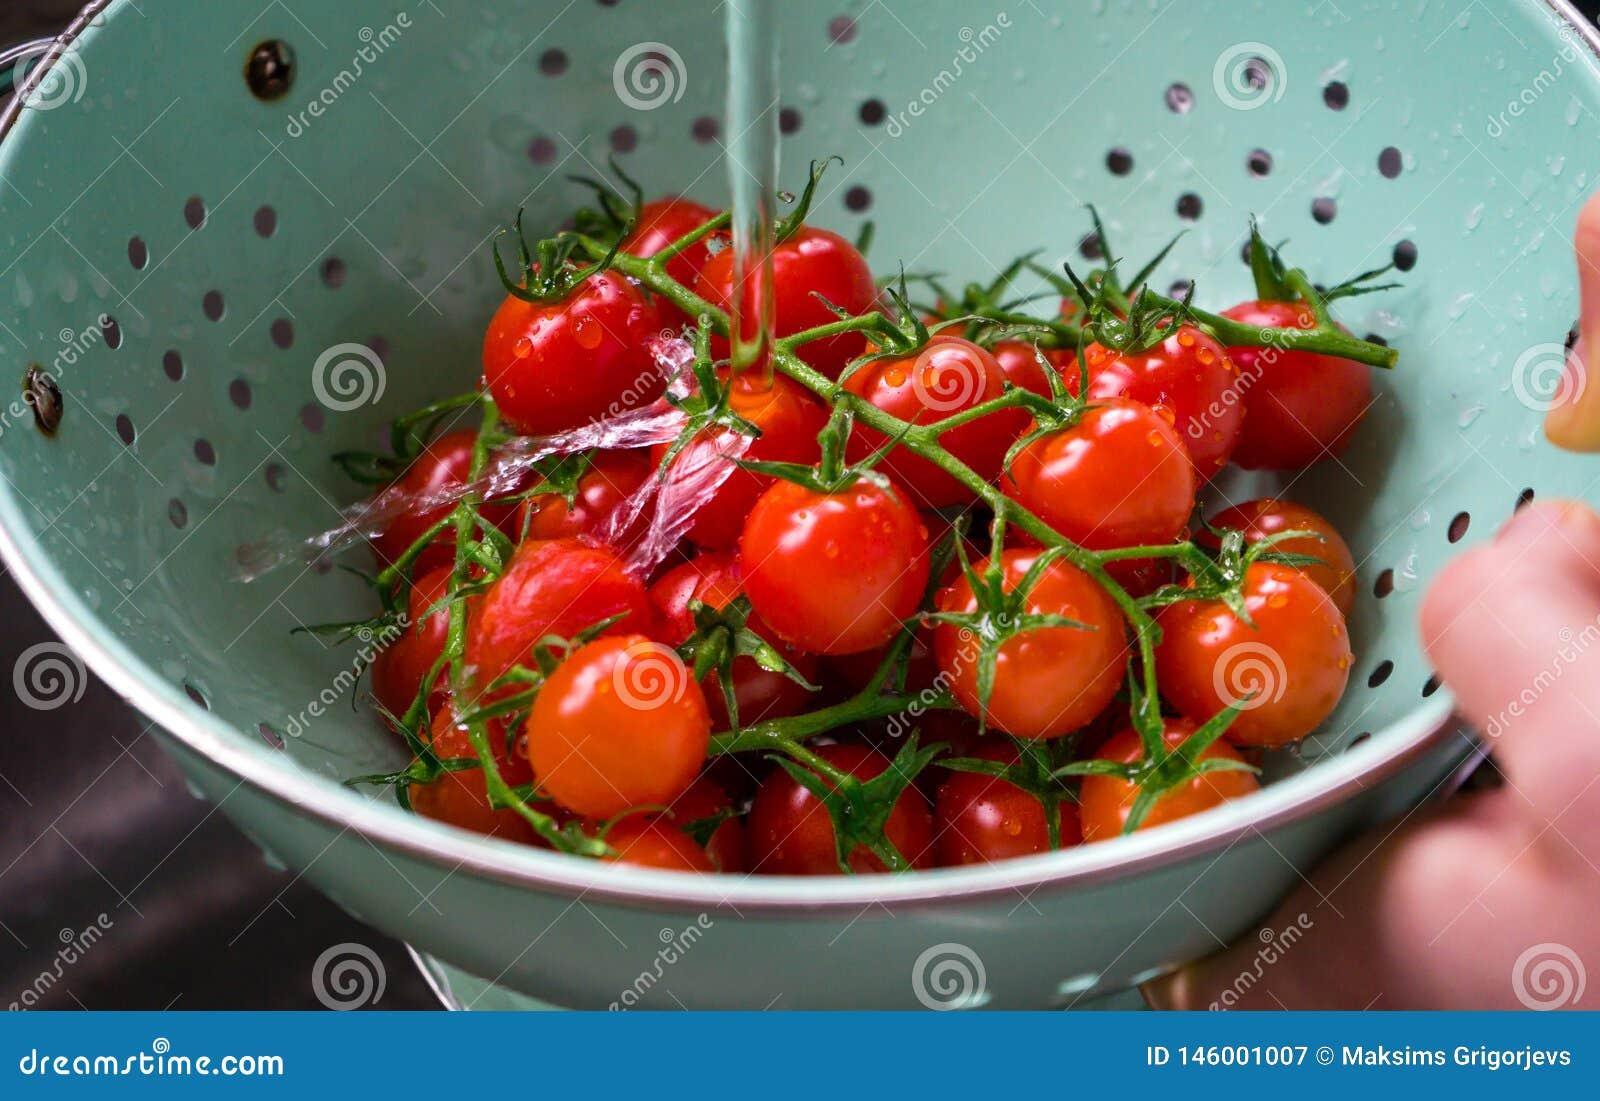 Tomates de cereza orgánicos frescos lavados en colador